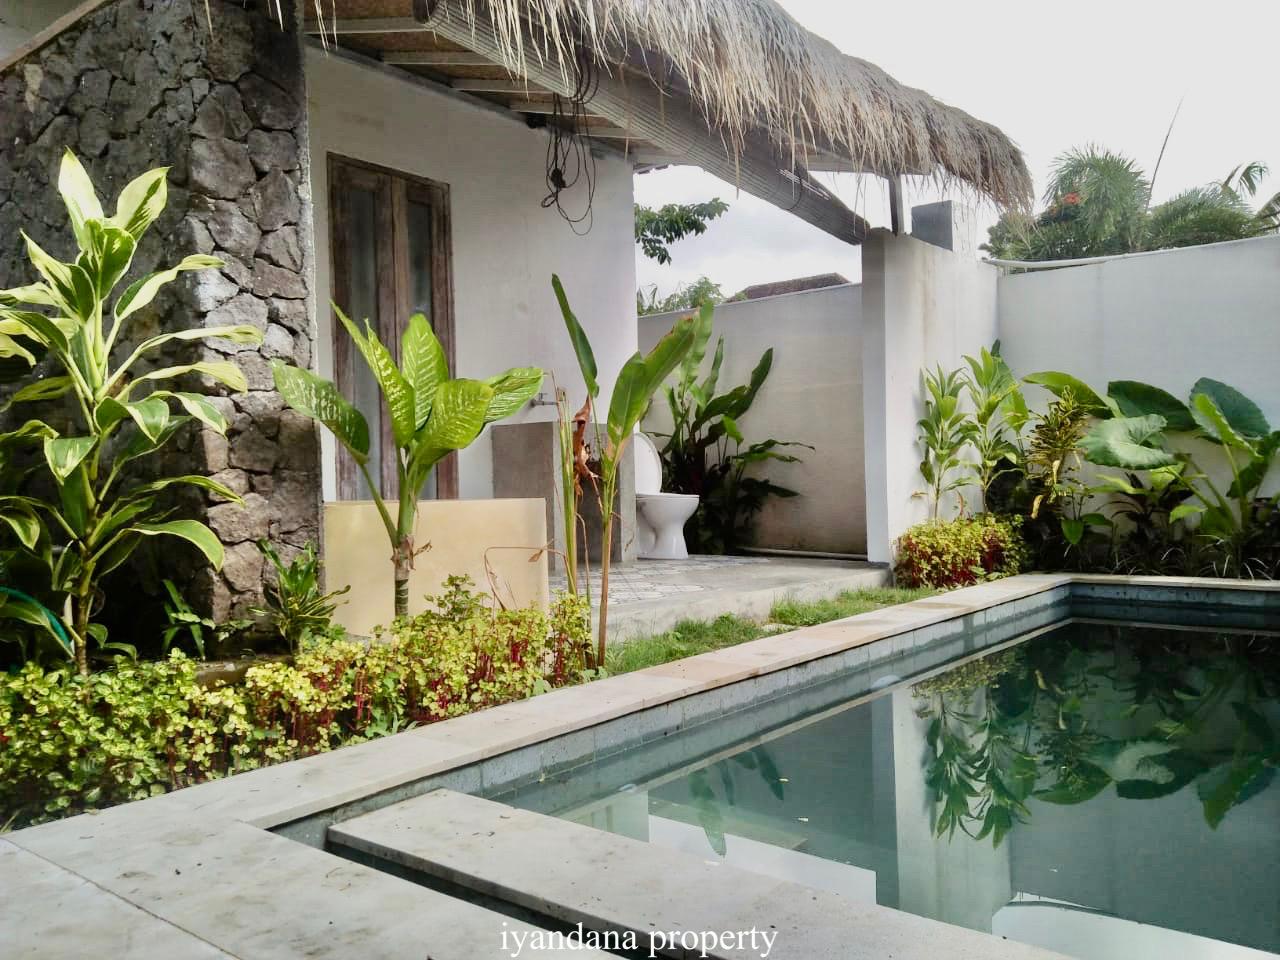 For rent sewa ID:B-137 villa ubud gianyar bali near central ubud